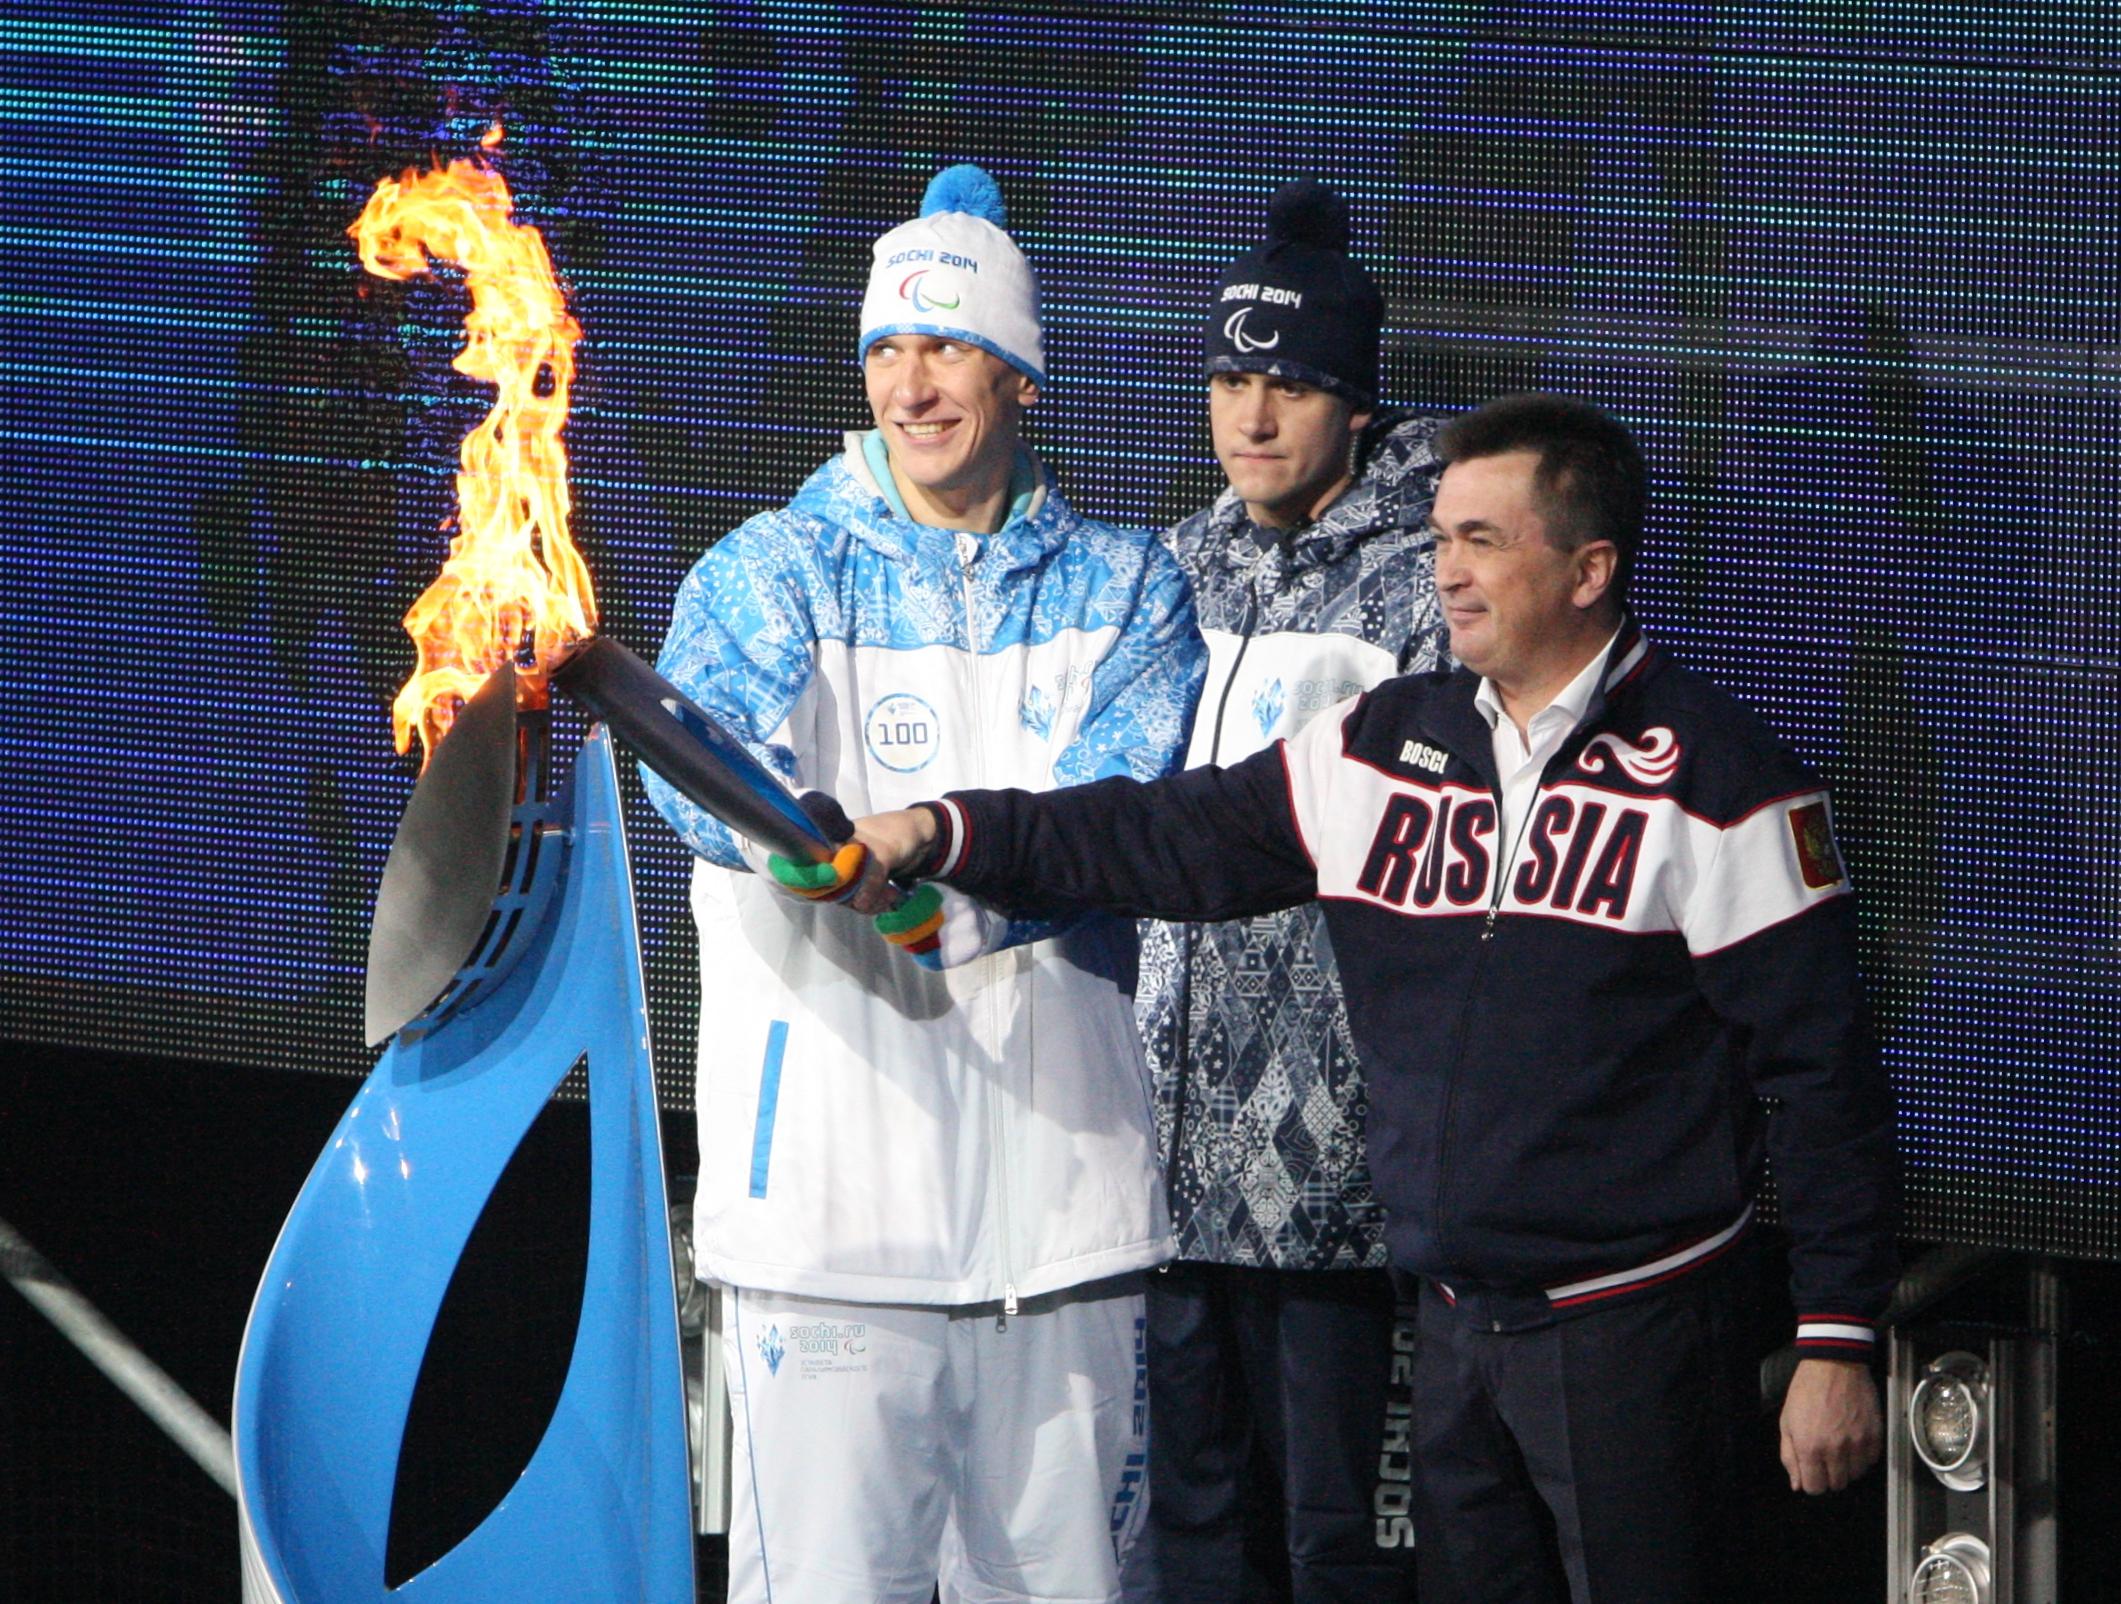 Факелоносец Виталий Оботин во время эстафеты Паралимпийского огня во Владивостоке